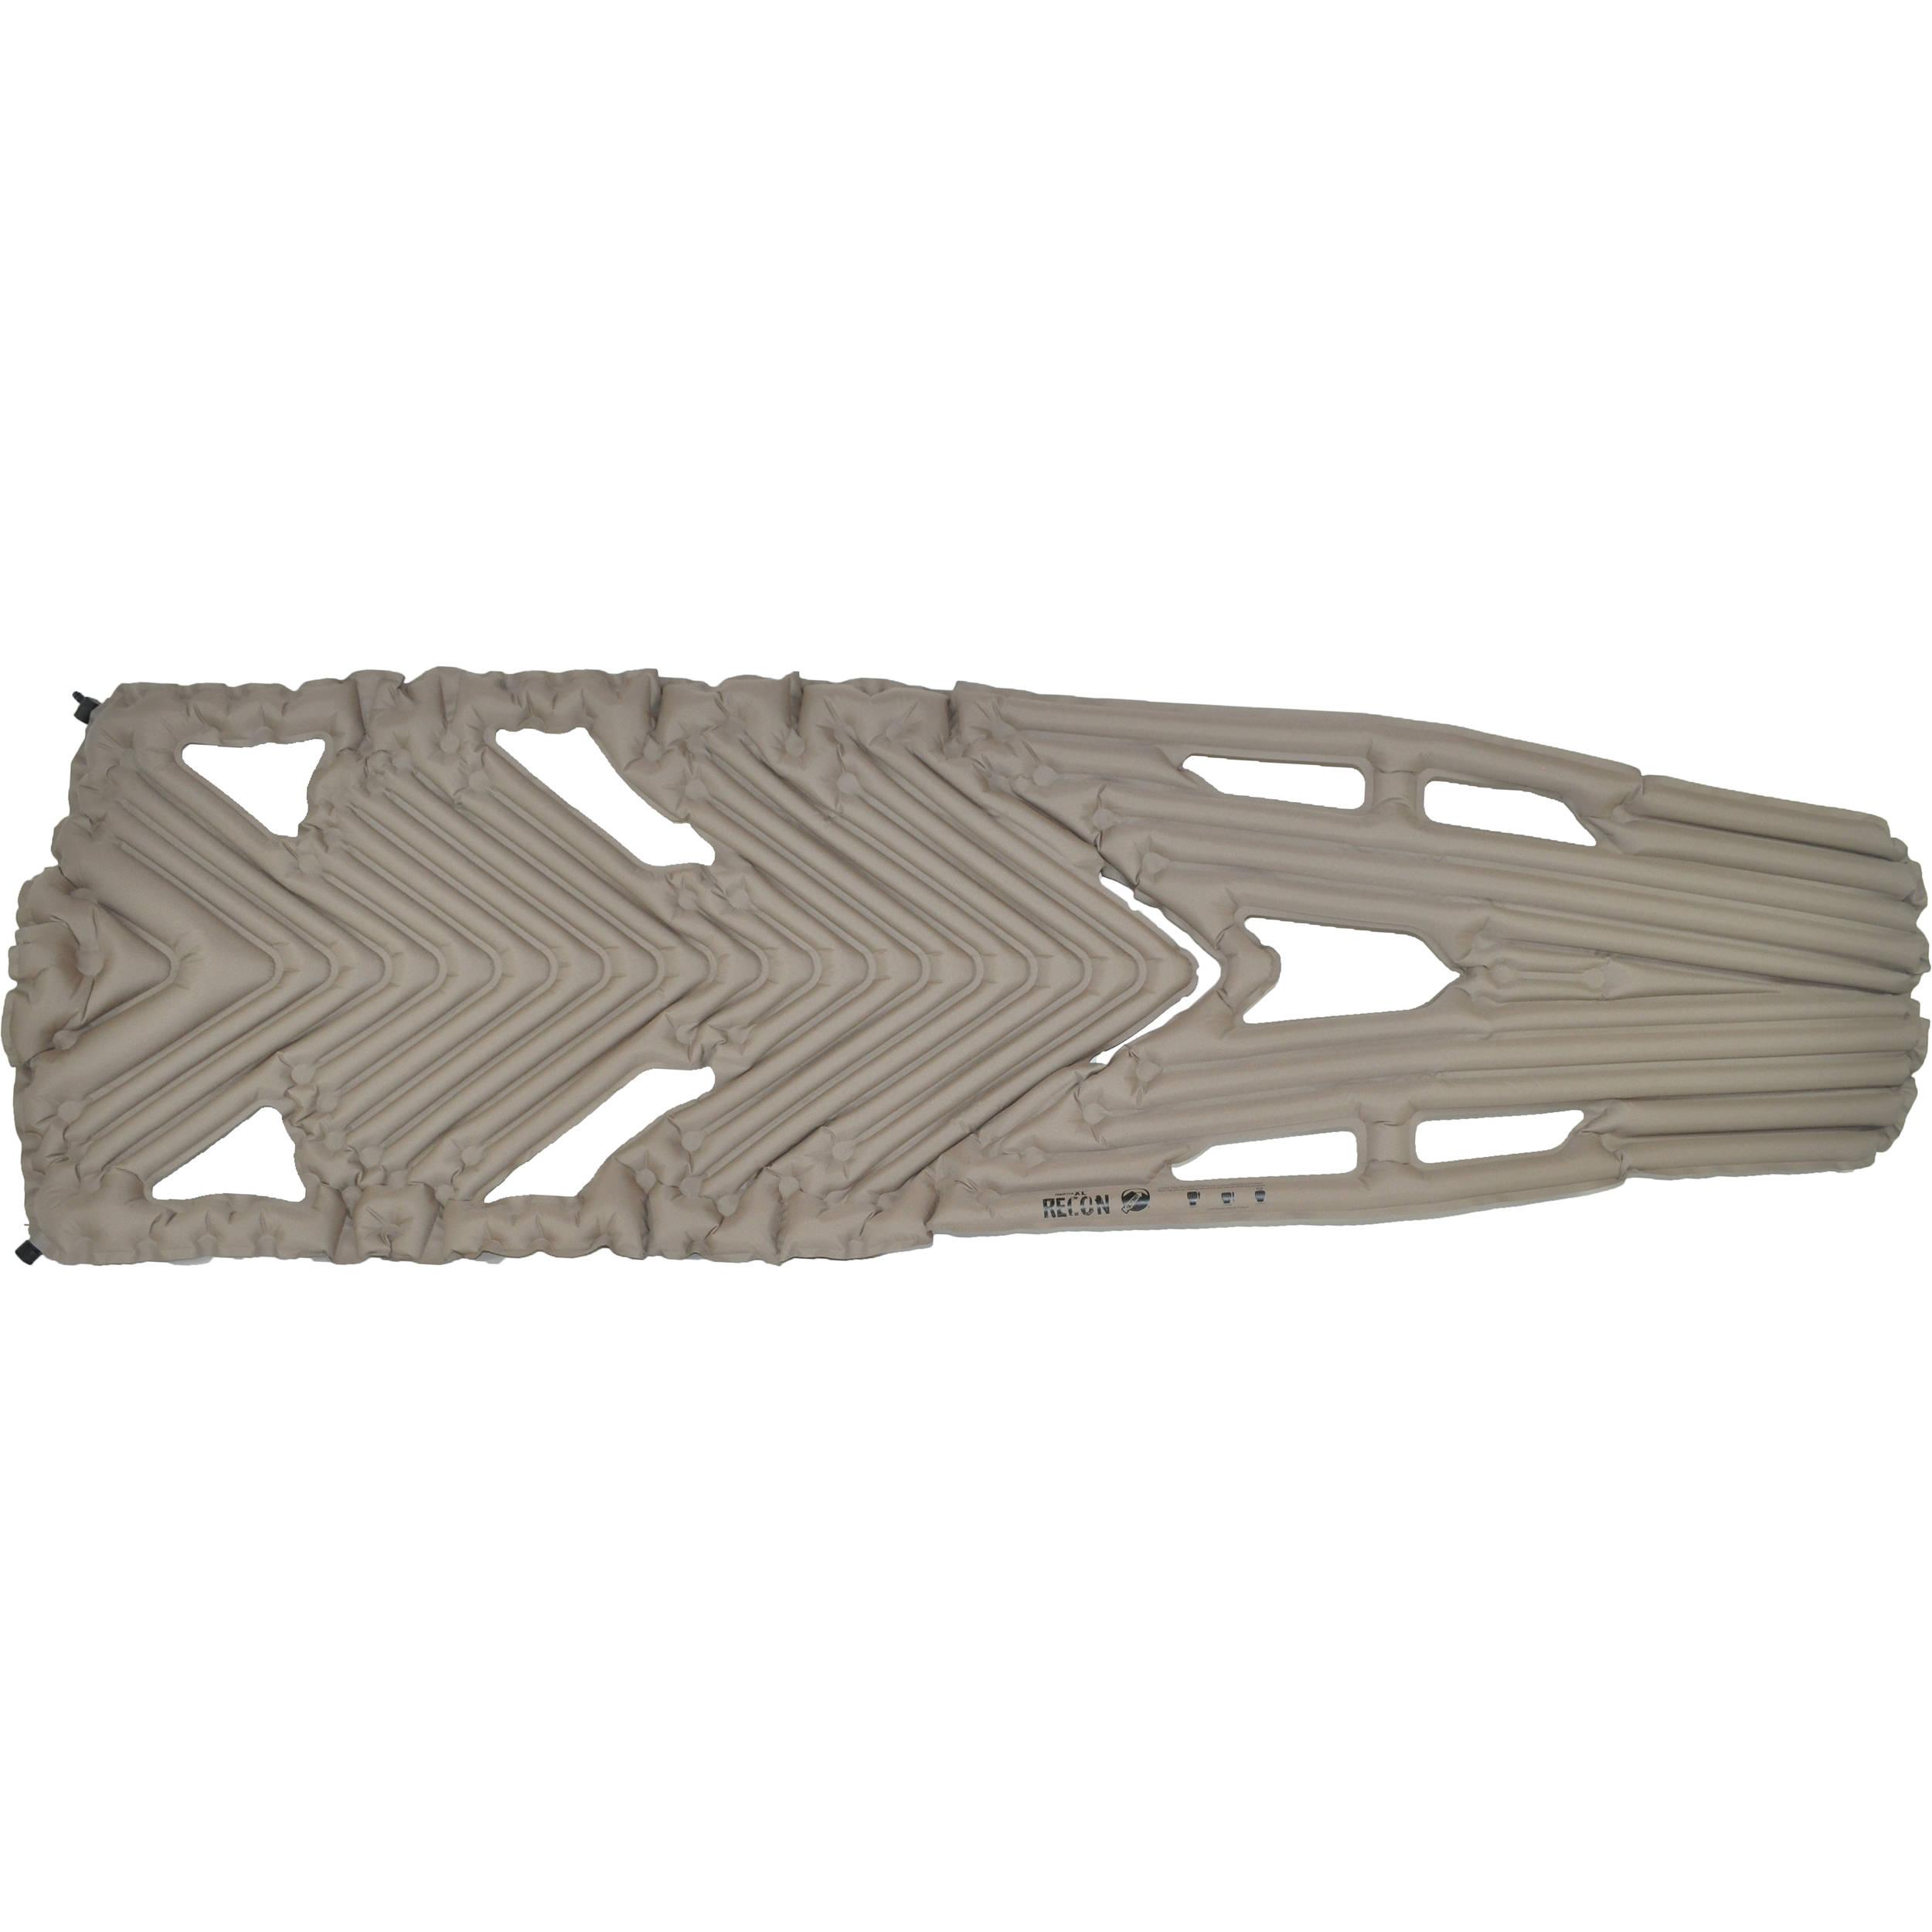 Klymit Inertia X Frame Recon Inflatable Sleeping Pad 06IXCY01C